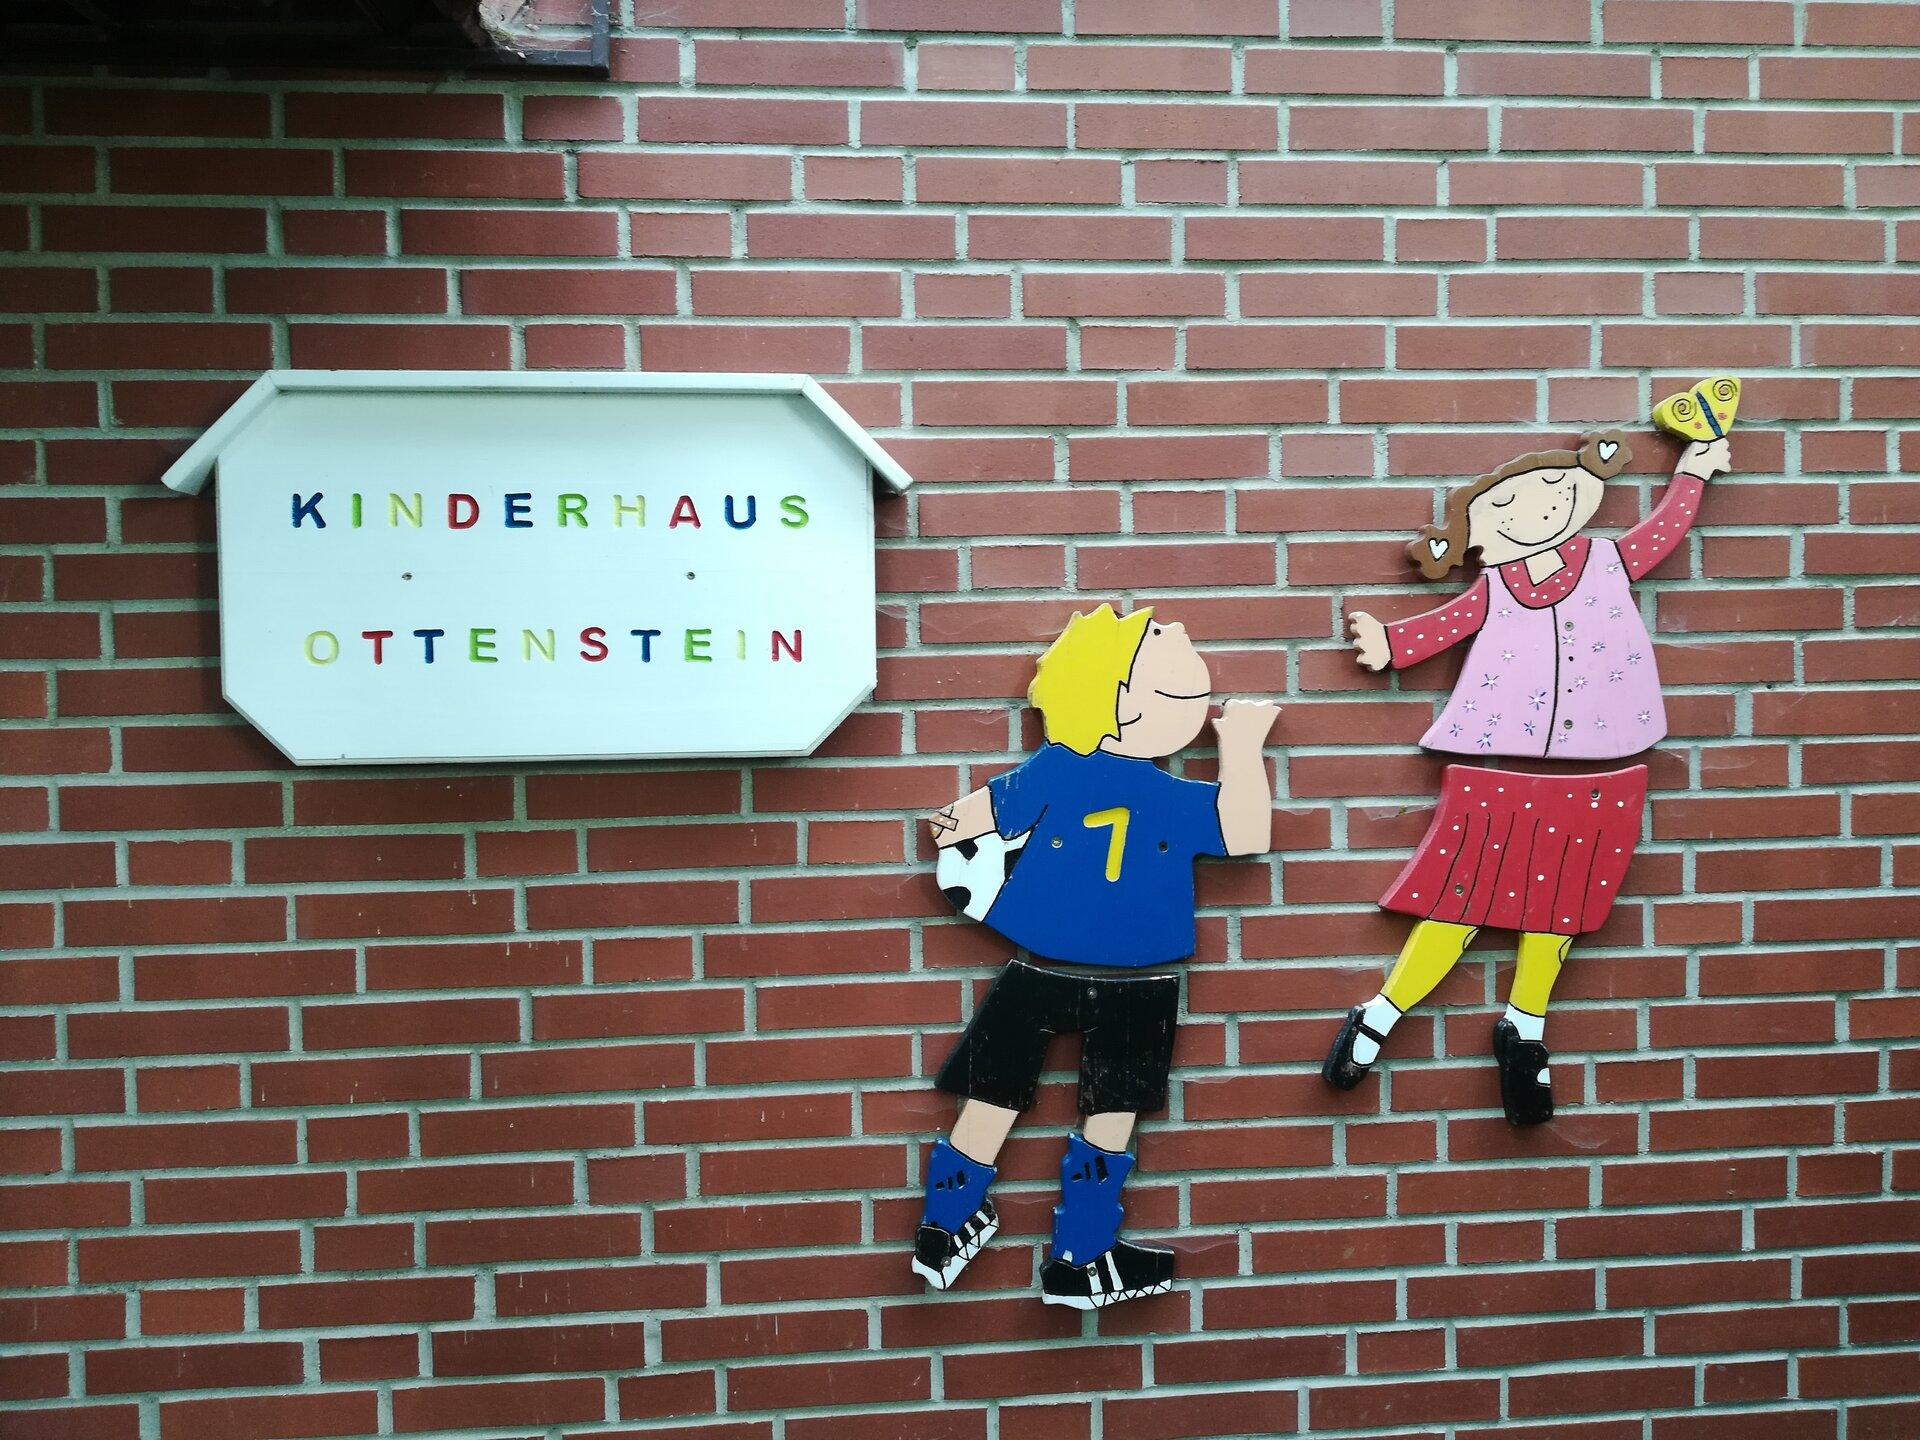 Willkommen im Kinderhaus!